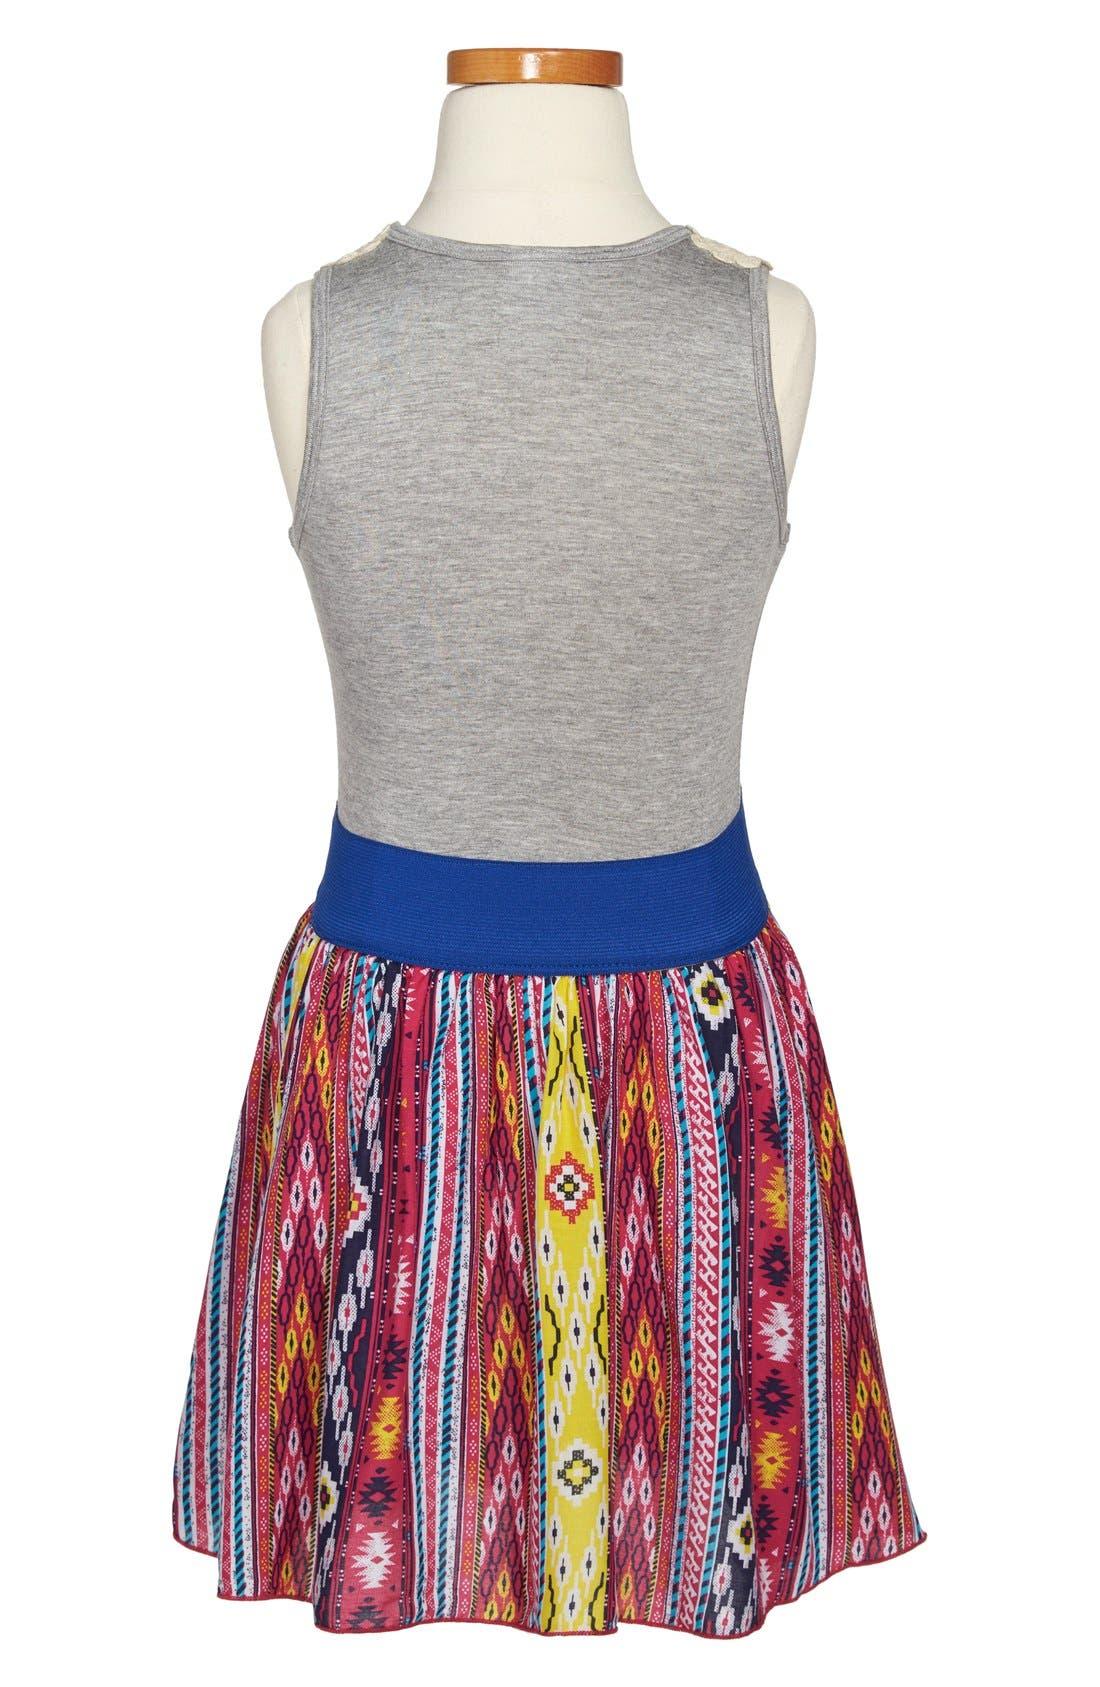 Alternate Image 2  - Twirls & Twigs 'Cluney' Sleeveless Dress (Little Girls & Big Girls)